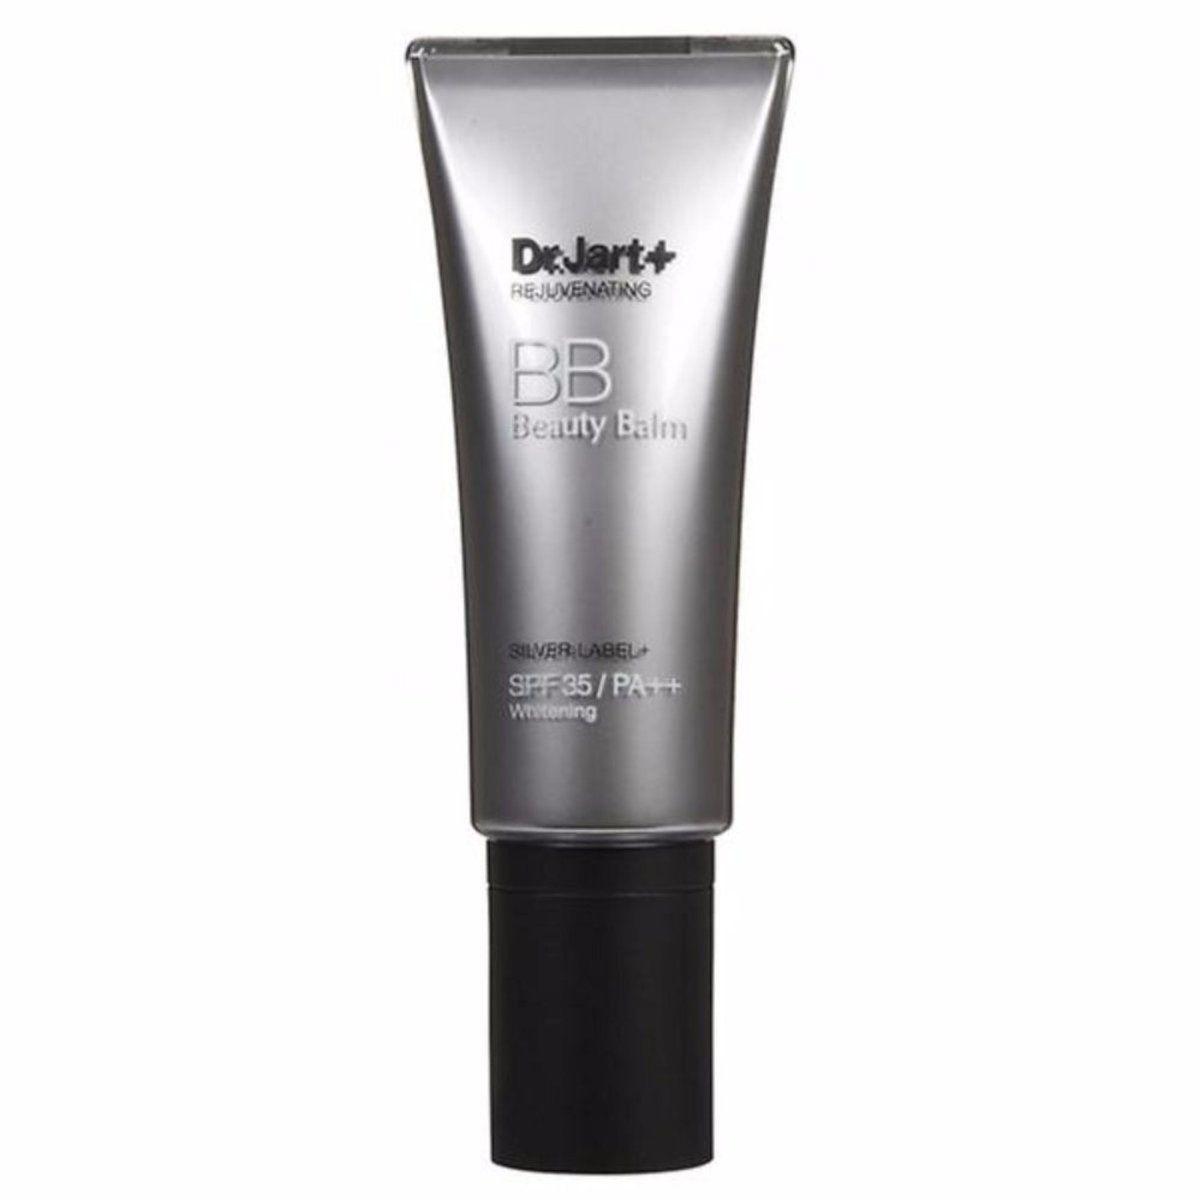 Dr. Jart+ Rejuvenating BB Cream SPF35 PA++ 40ml  Face Makeup CC Cream Whitening Concealer Foundation Moisturize Korean Cosmetics